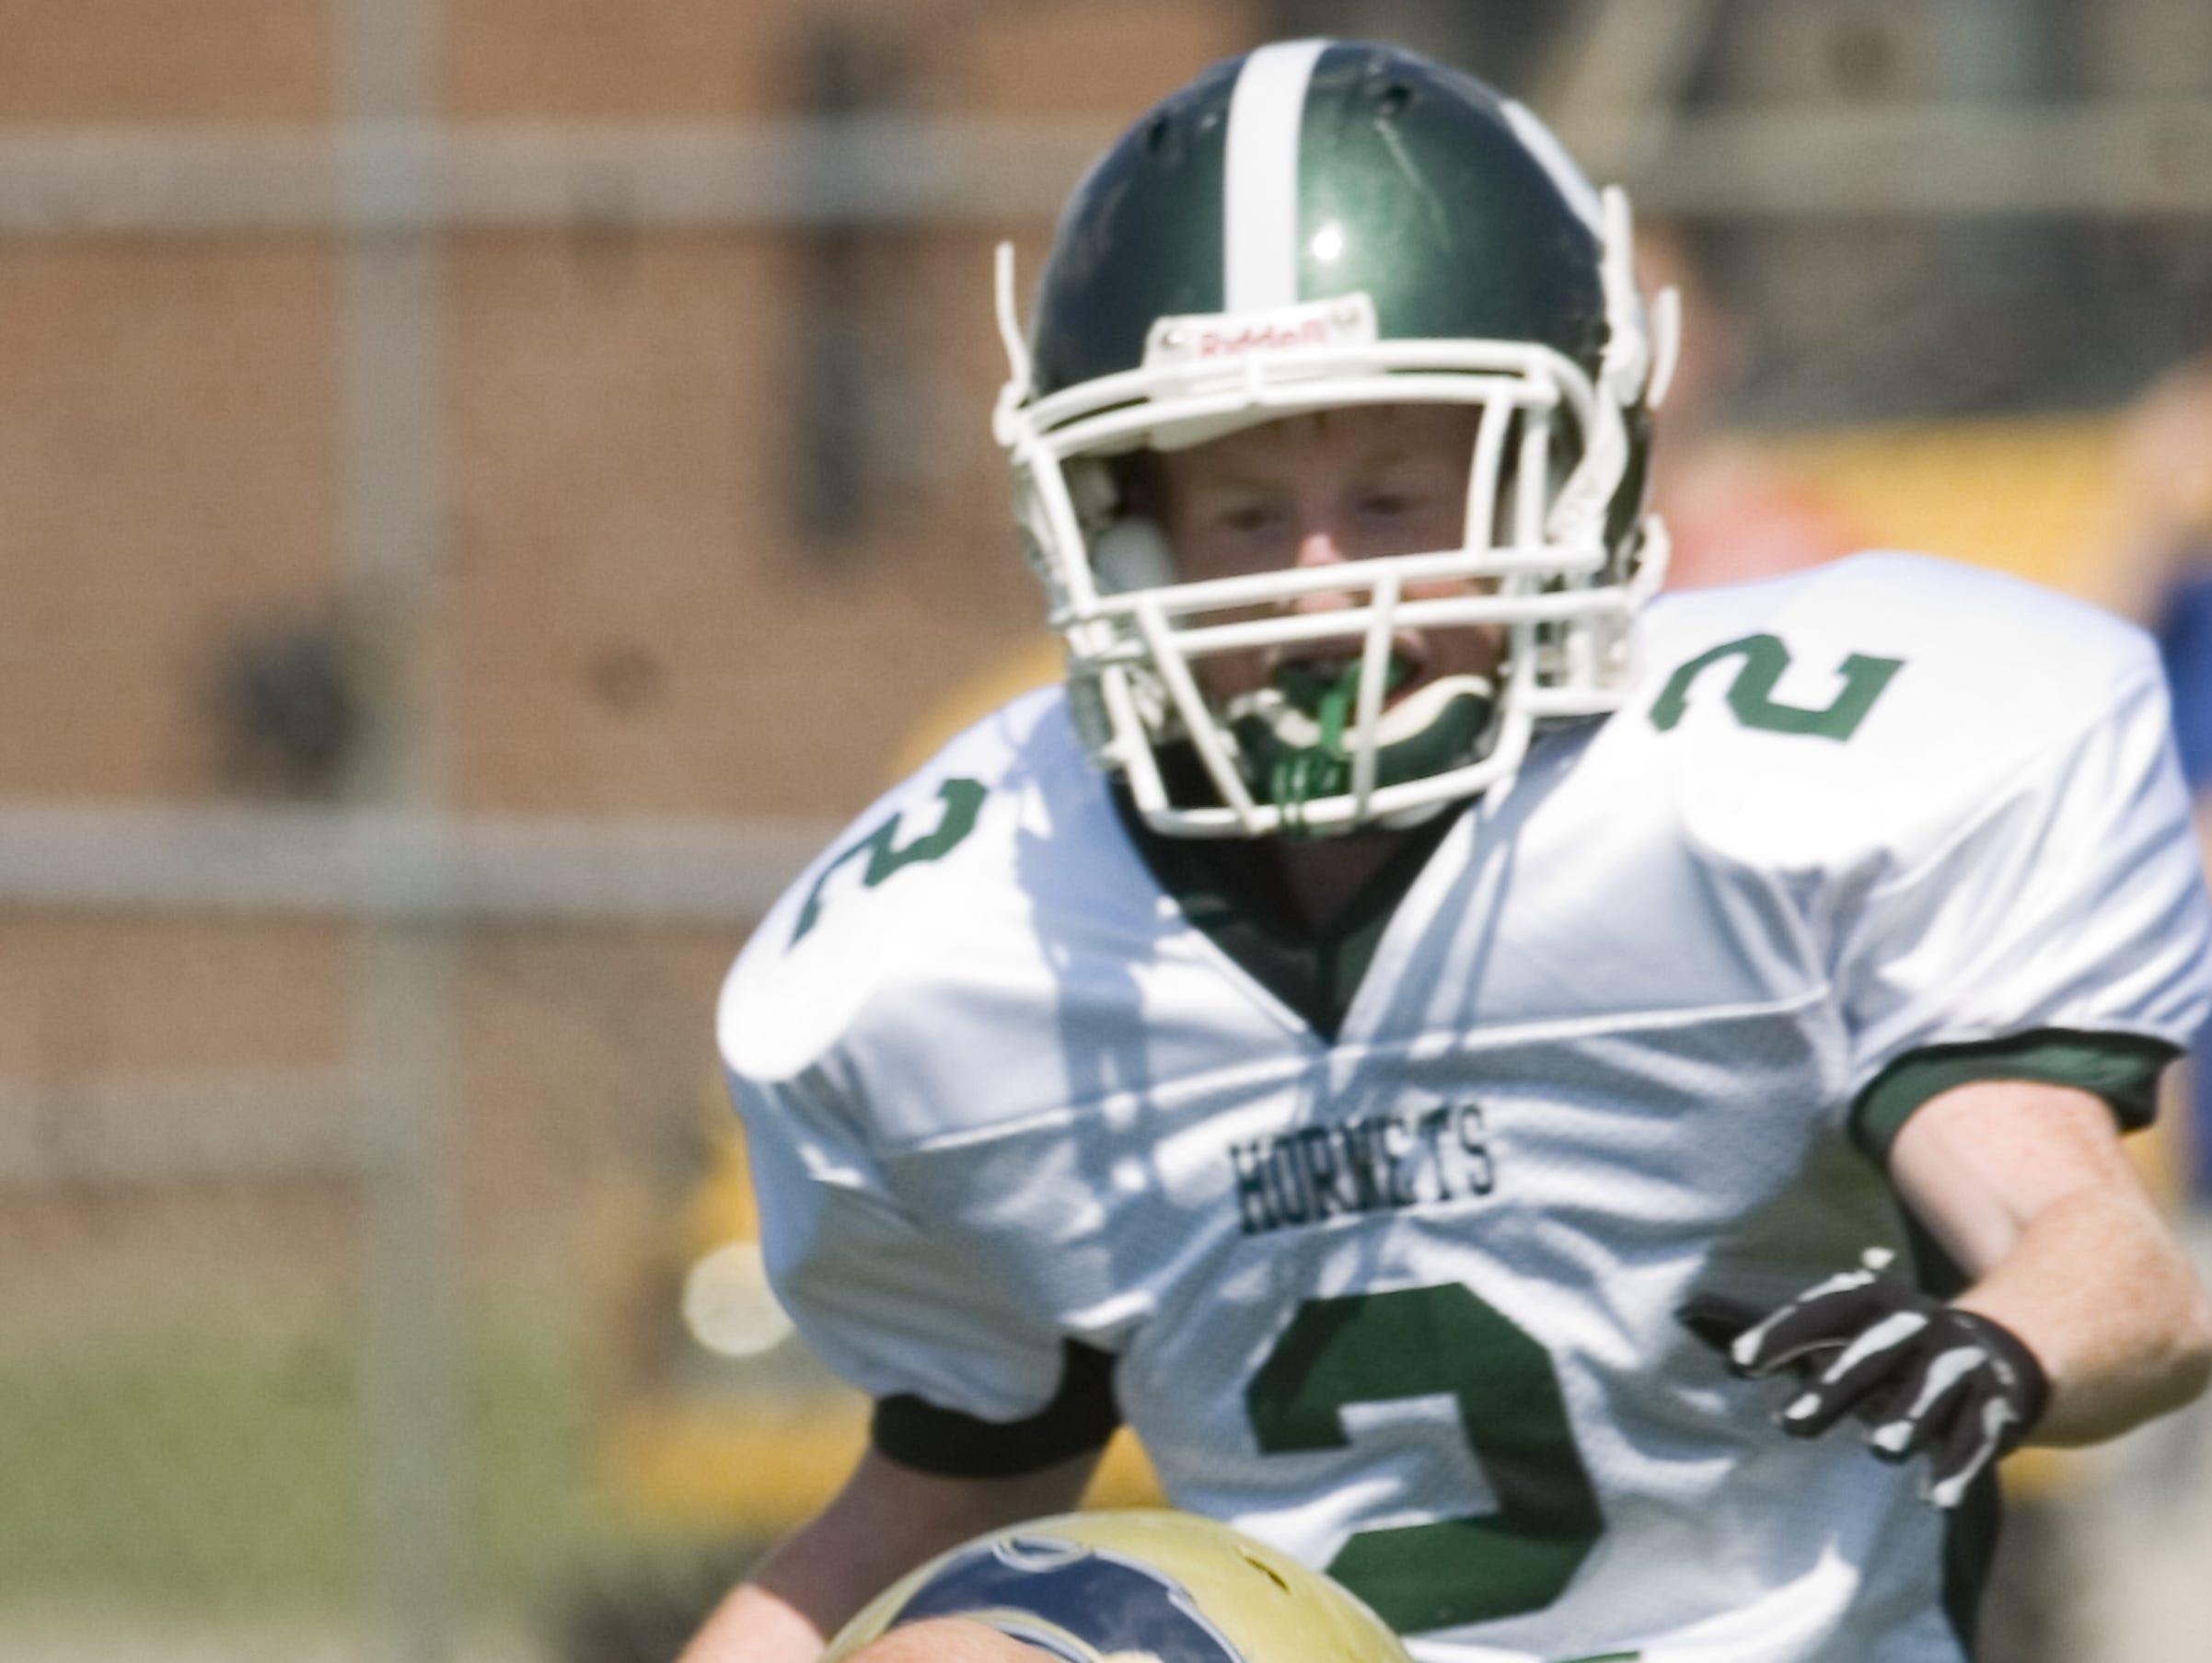 Susquehanna Valley High School plays against Southside High School on Saturday, September 5, 2009.